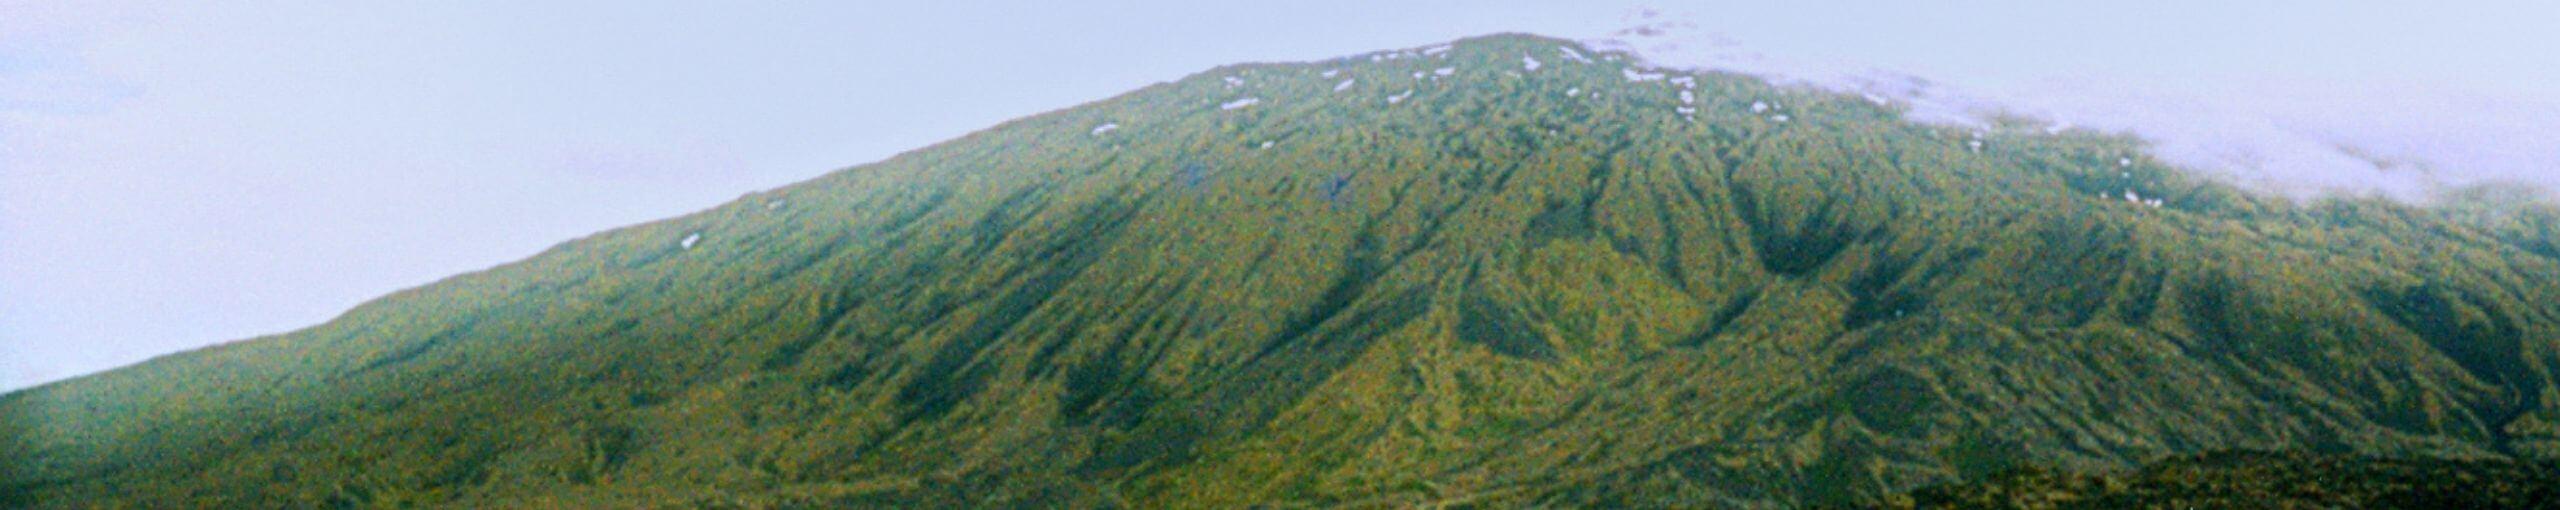 Volcán Snaefells Snæfellsjökull. Vesturland, Islandia.